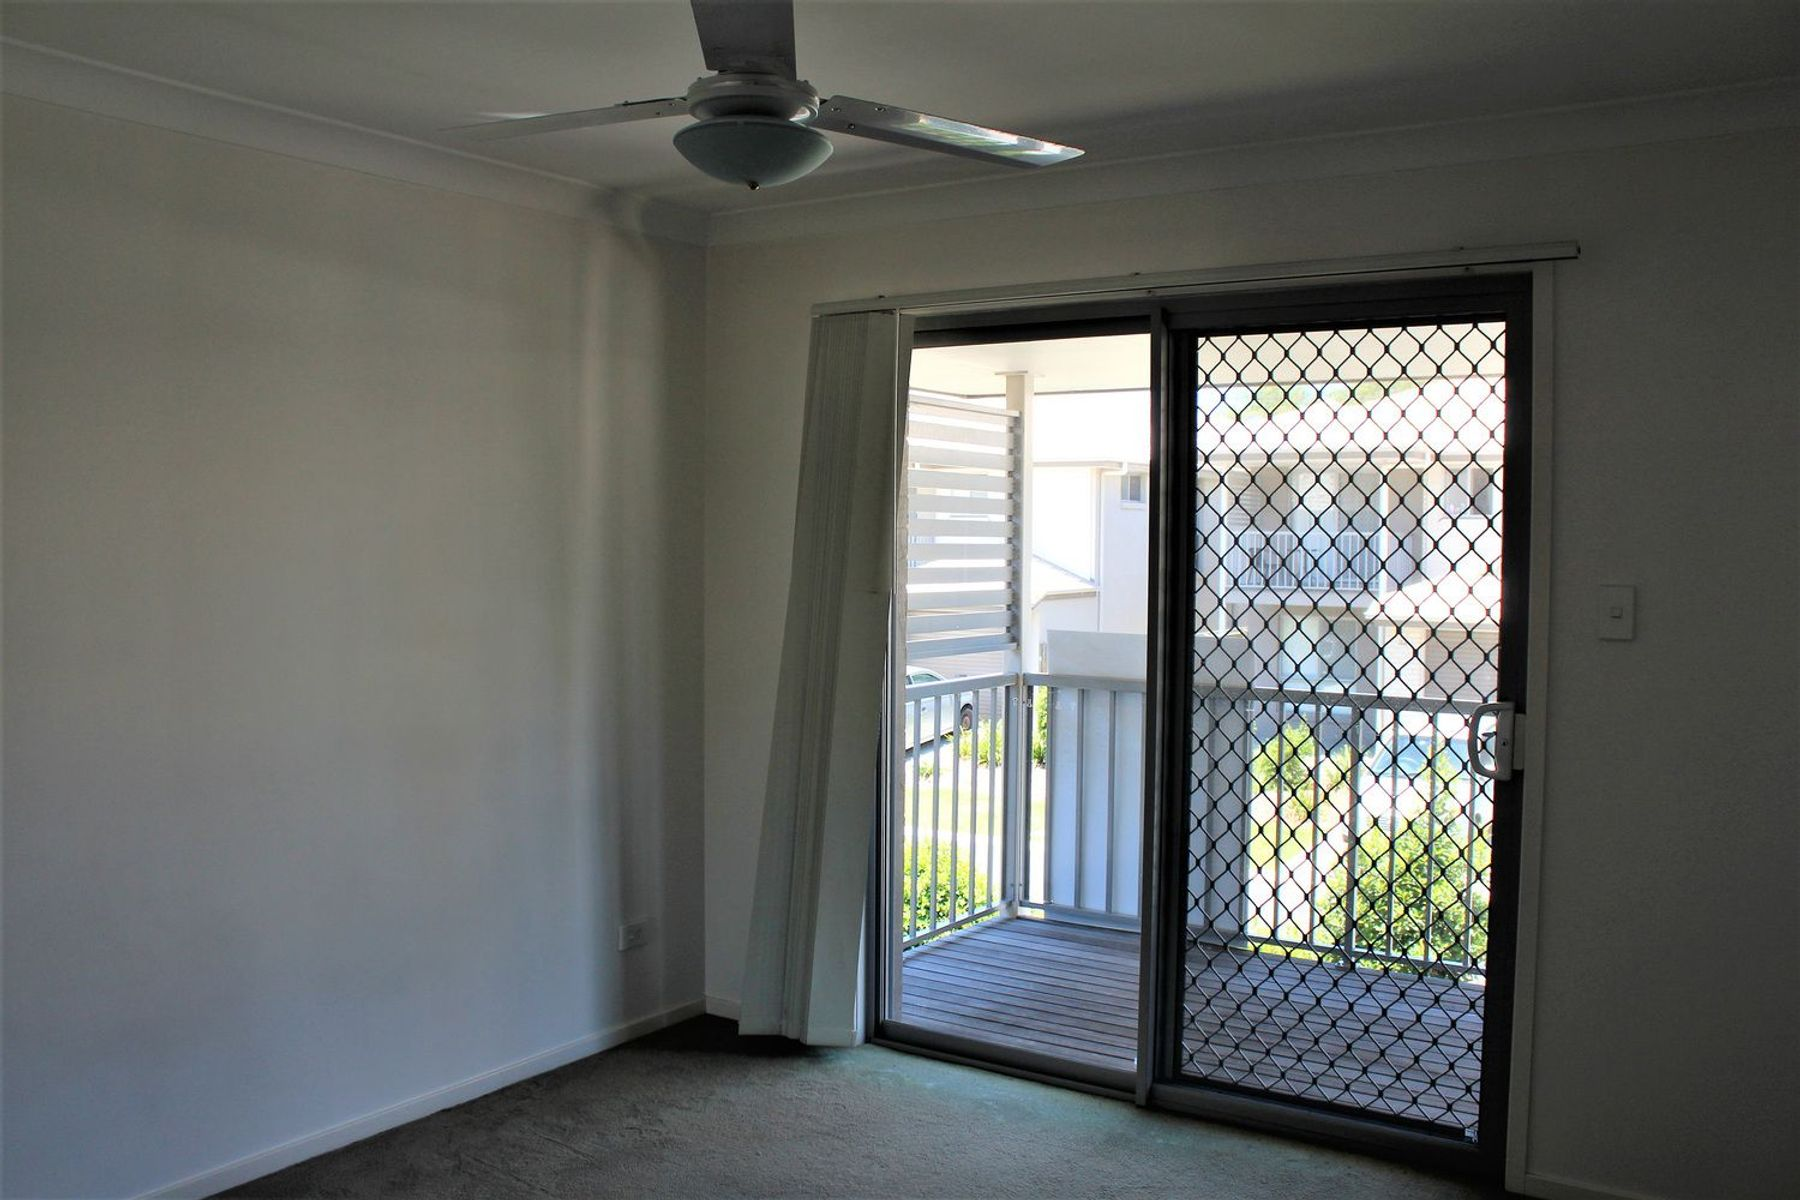 47/65-87 Demeio Road, Berrinba, QLD 4117